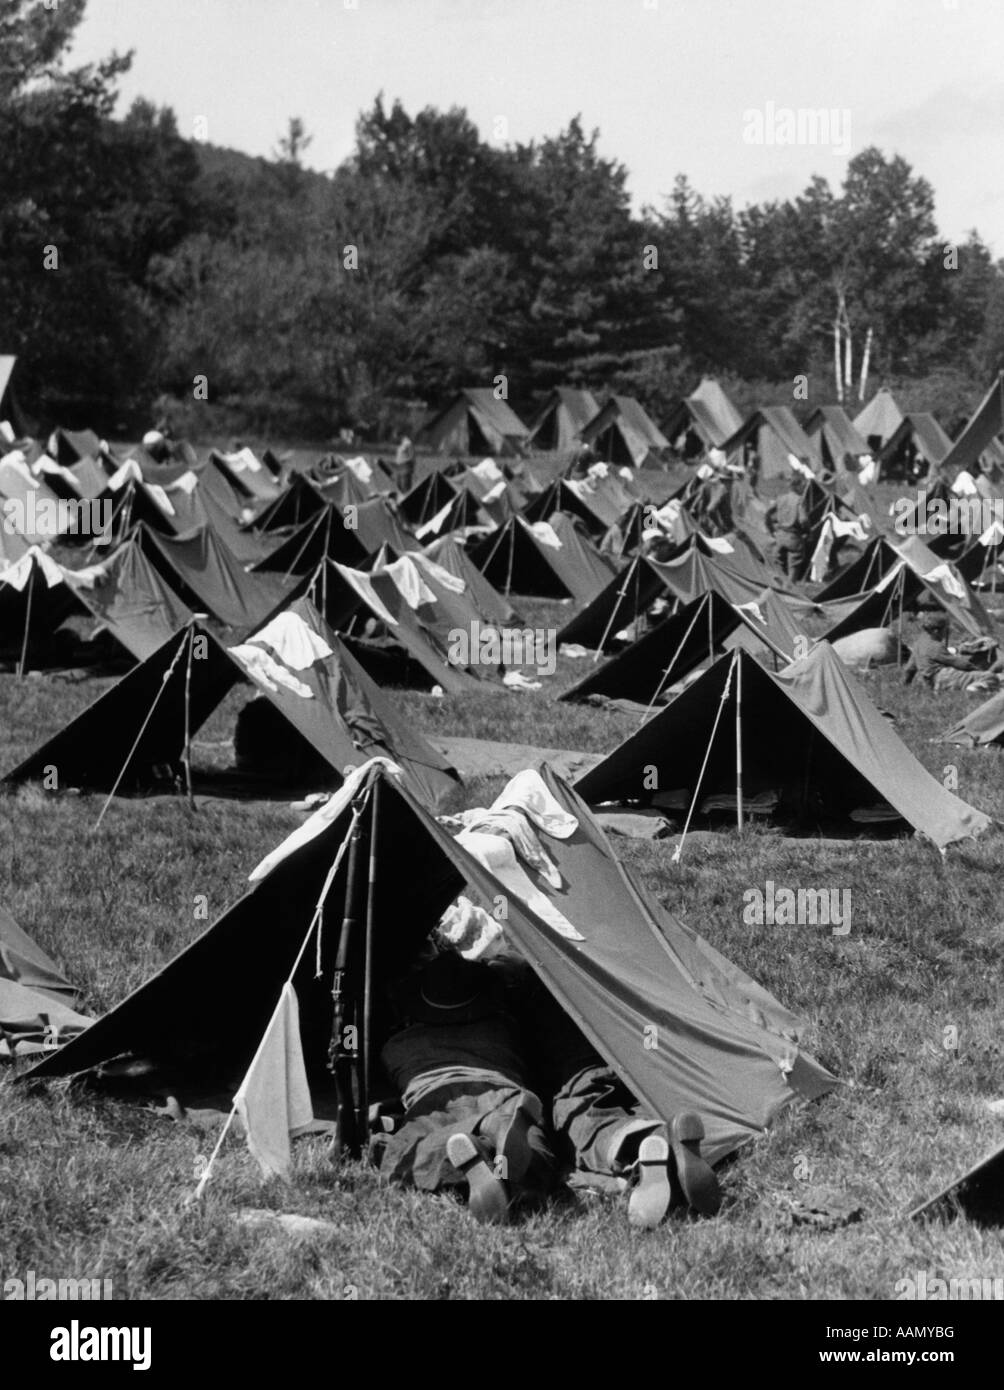 1940s WORLD WAR II SOLDIER PUP TENTS Stock Photo: 12666099 ...